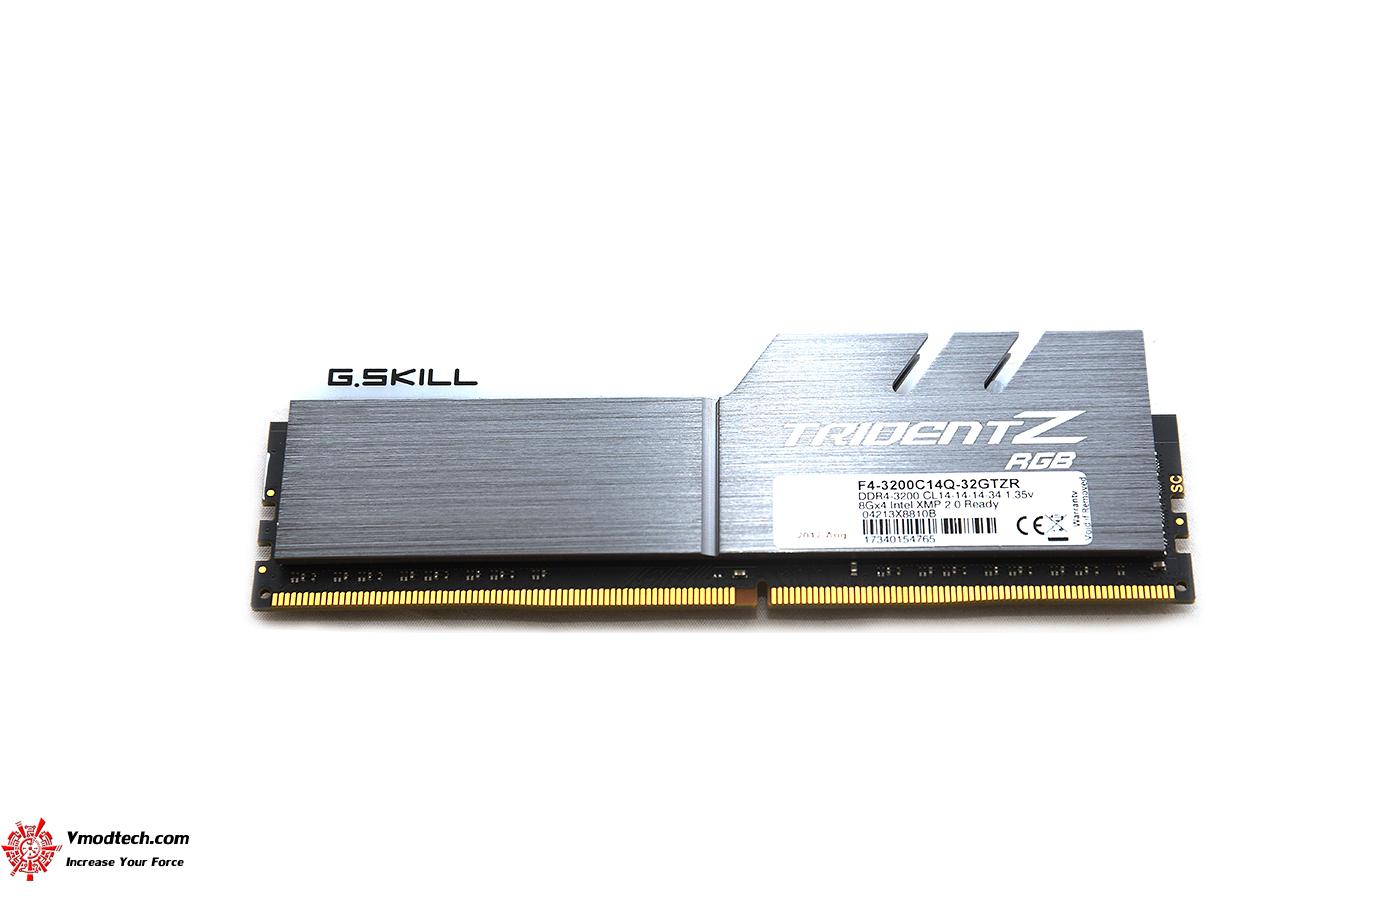 dsc 2952 G.SKILL Trident Z RGB DDR4 3200MHz 32GB (8GBx4) Quad Channel Review